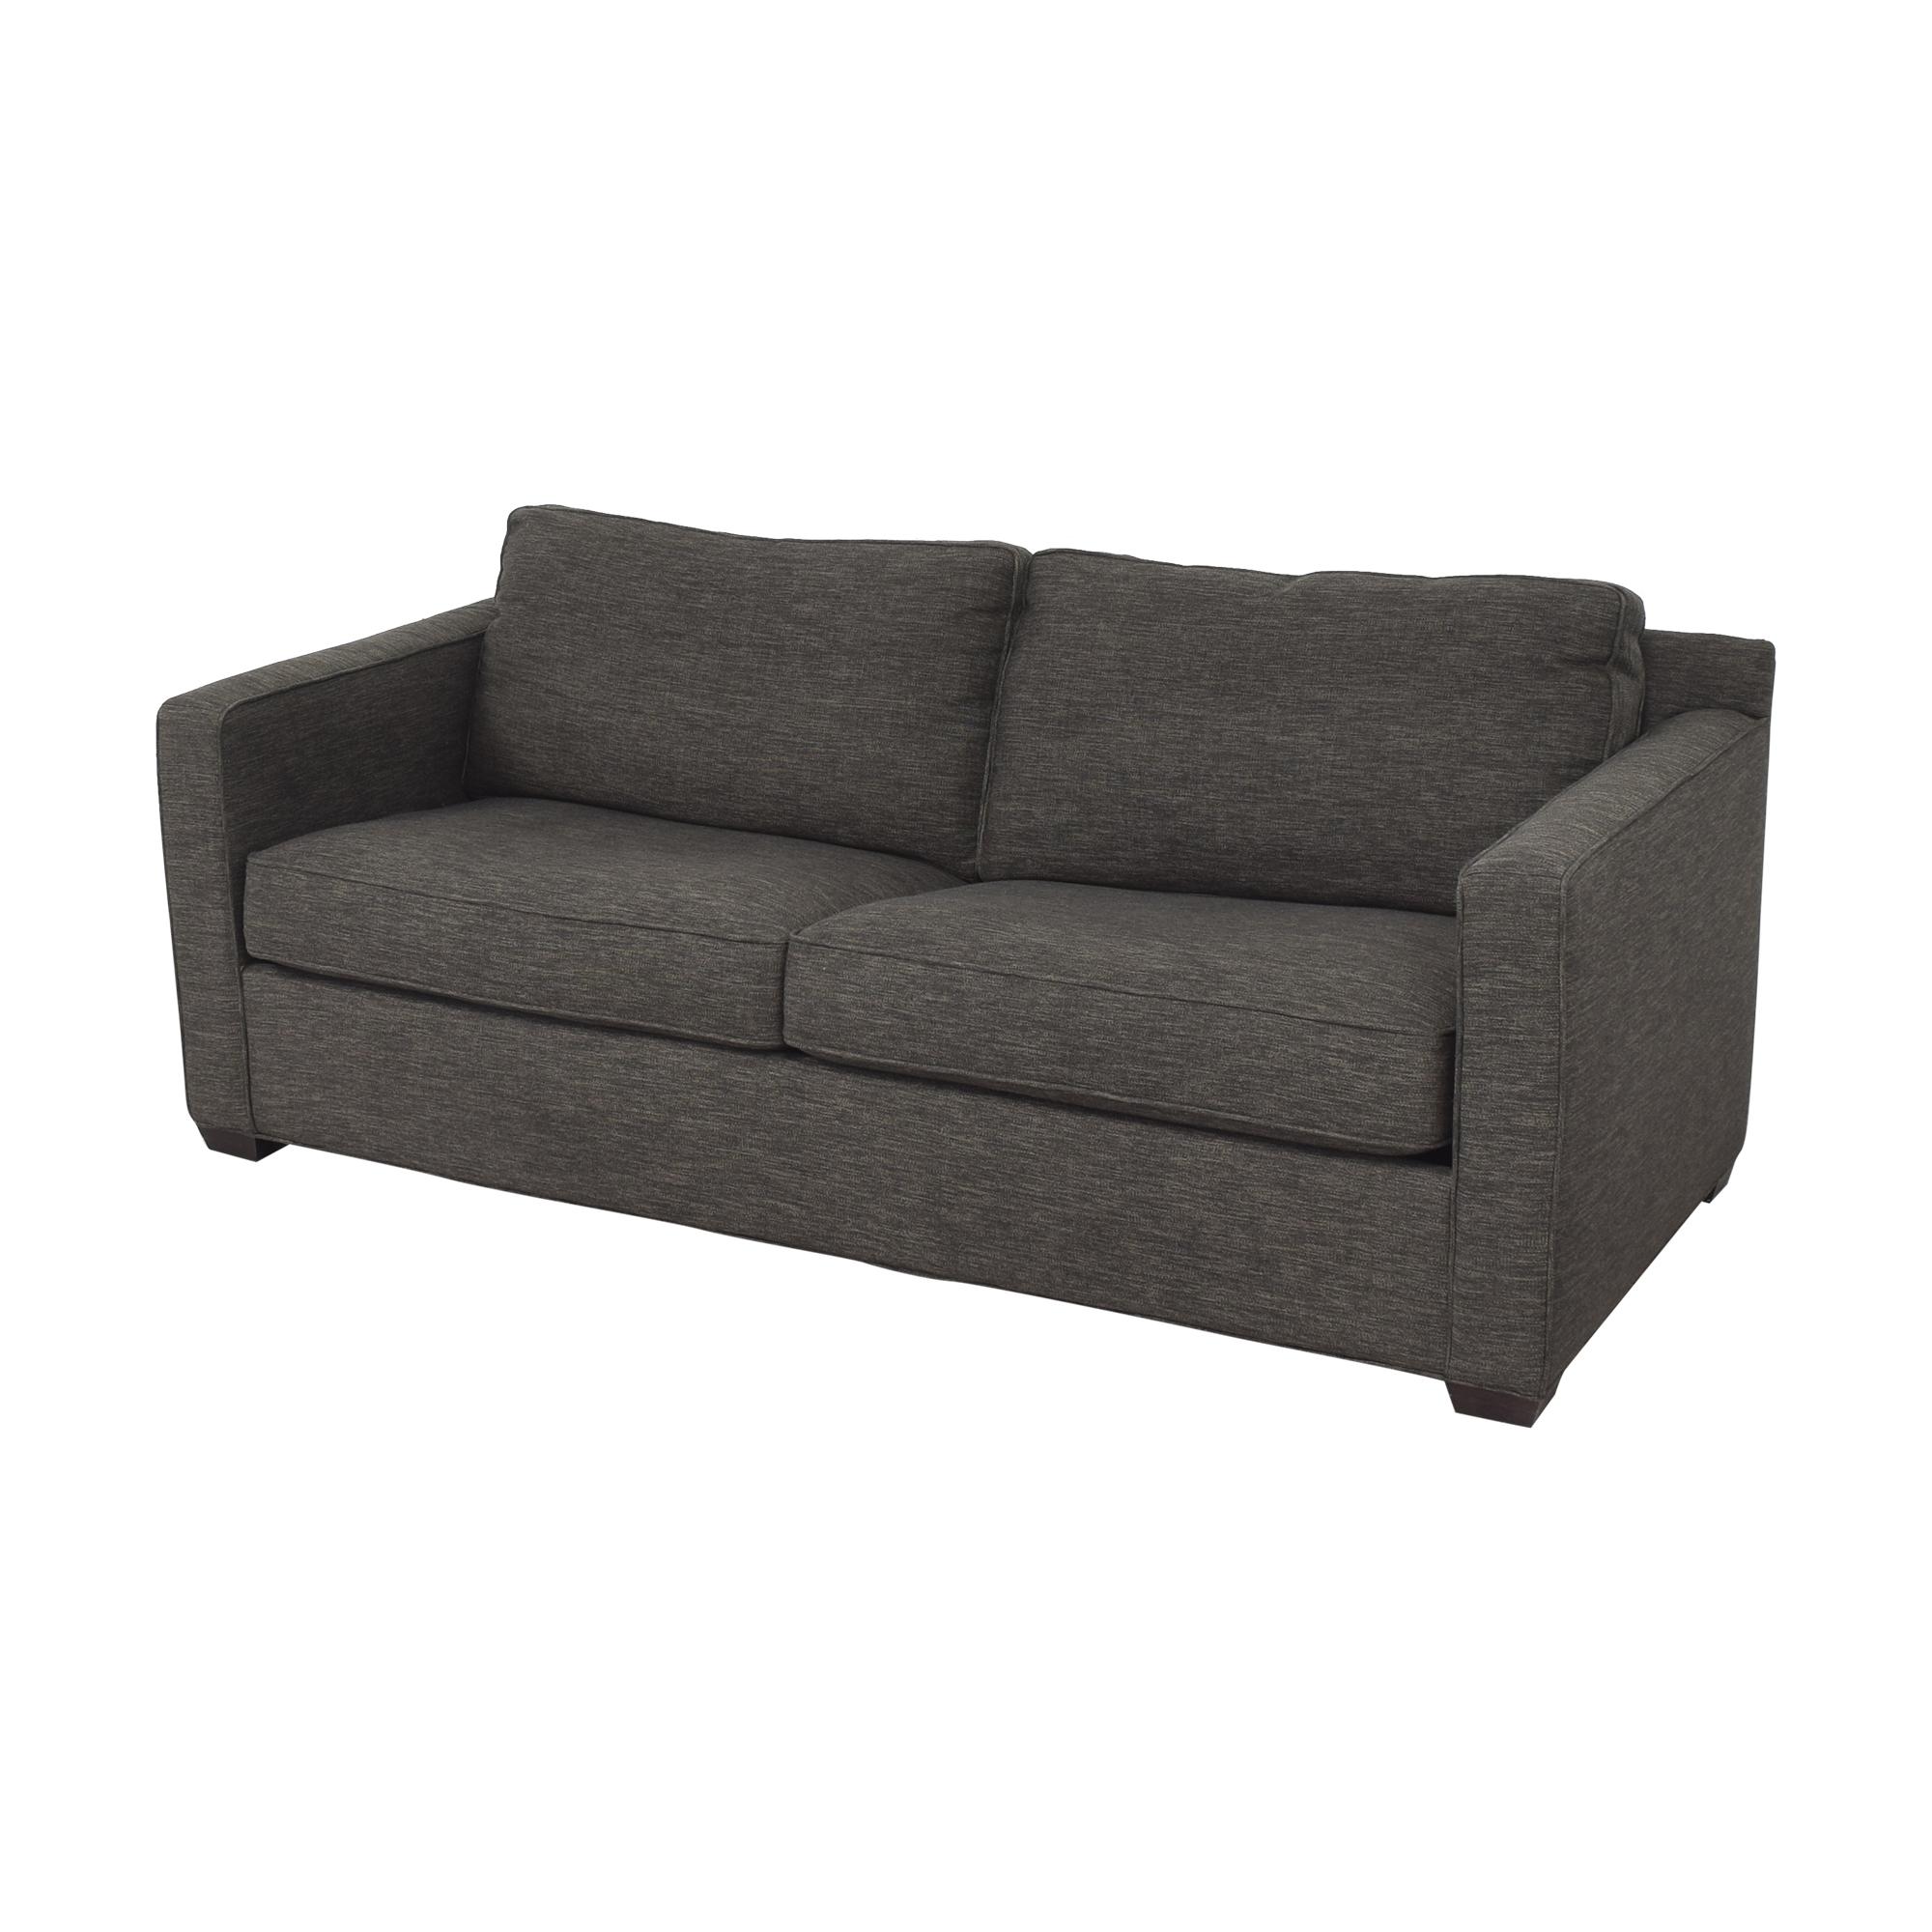 Crate & Barrel Crate & Barrel Davis Queen Sleeper Sofa